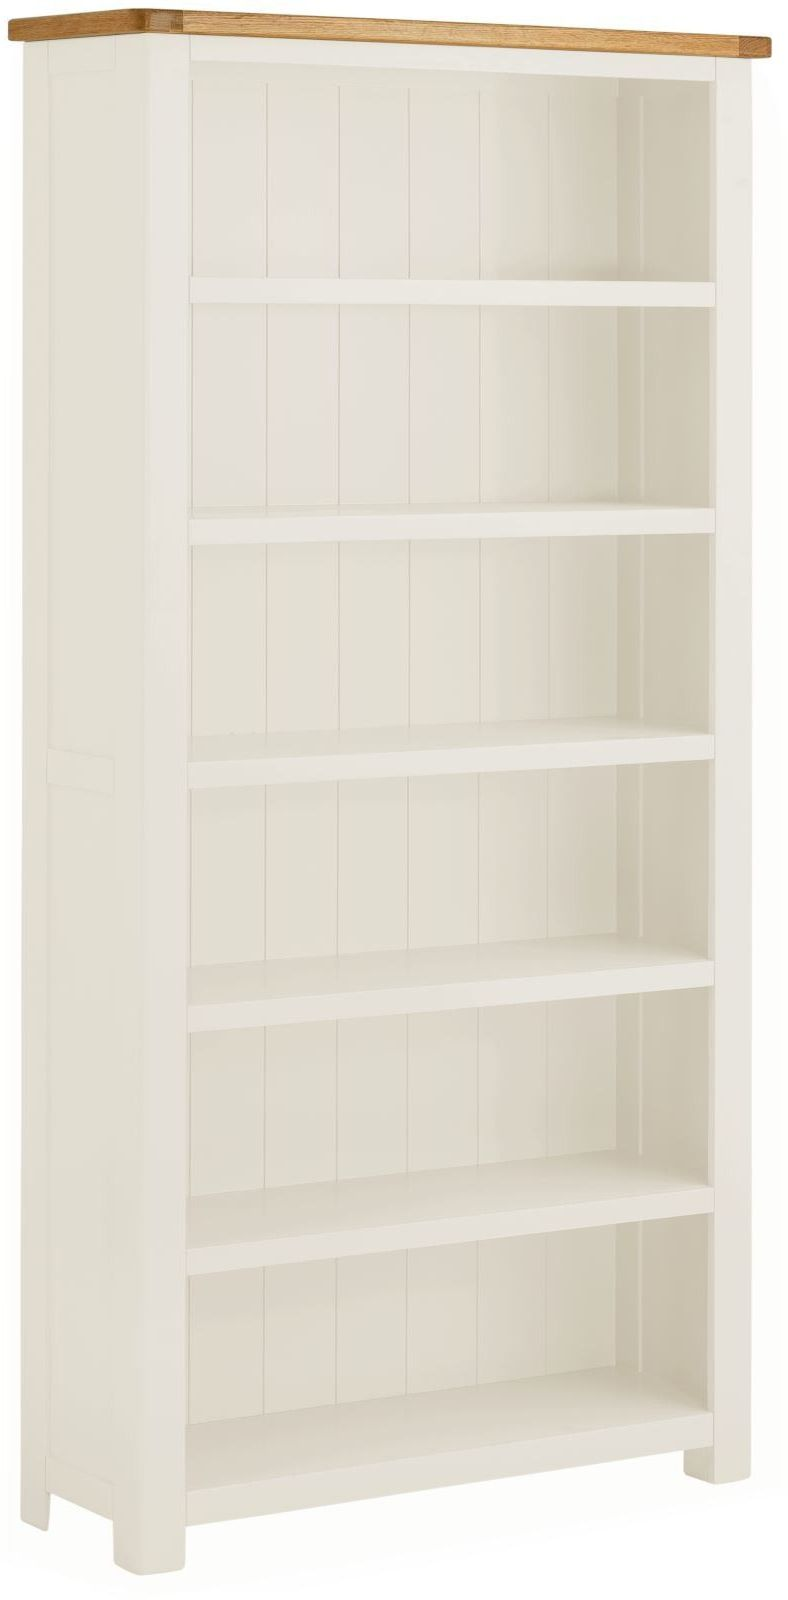 Stratton White Bookcase Large